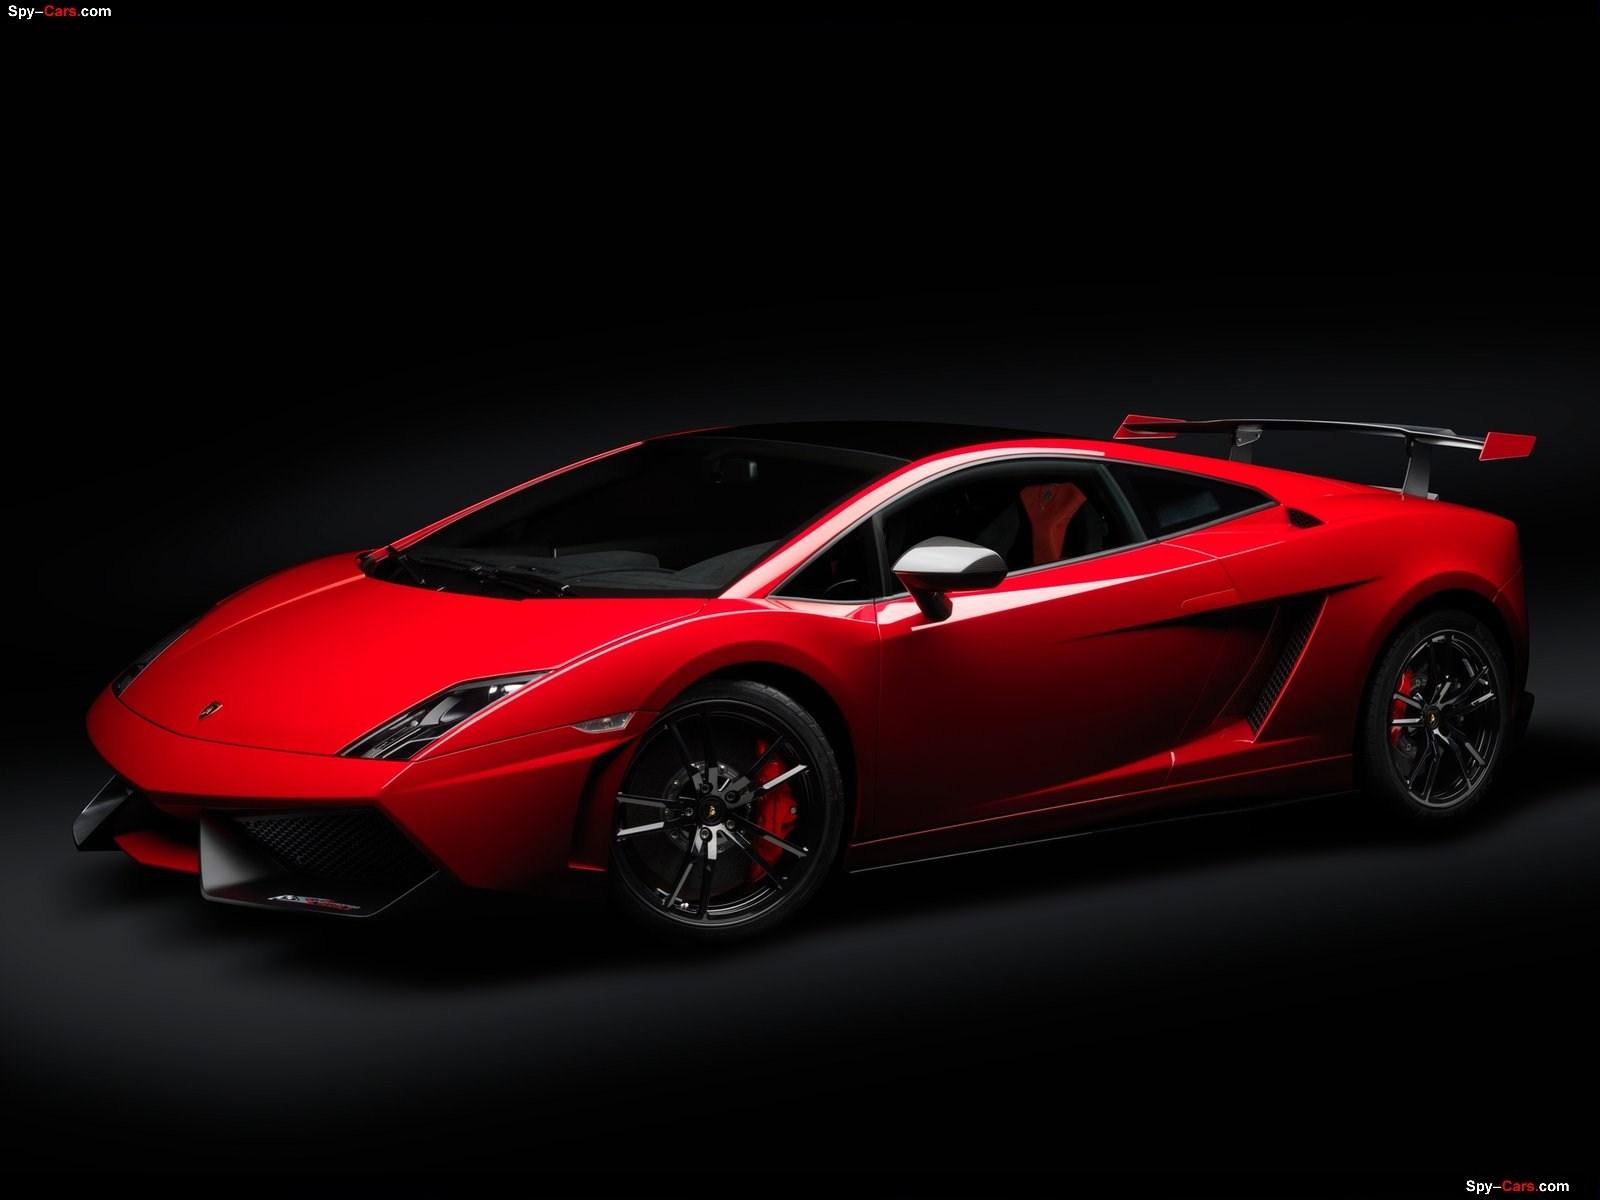 2012 Lamborghini Gallardo LP570 4 Super Trofeo Stradale